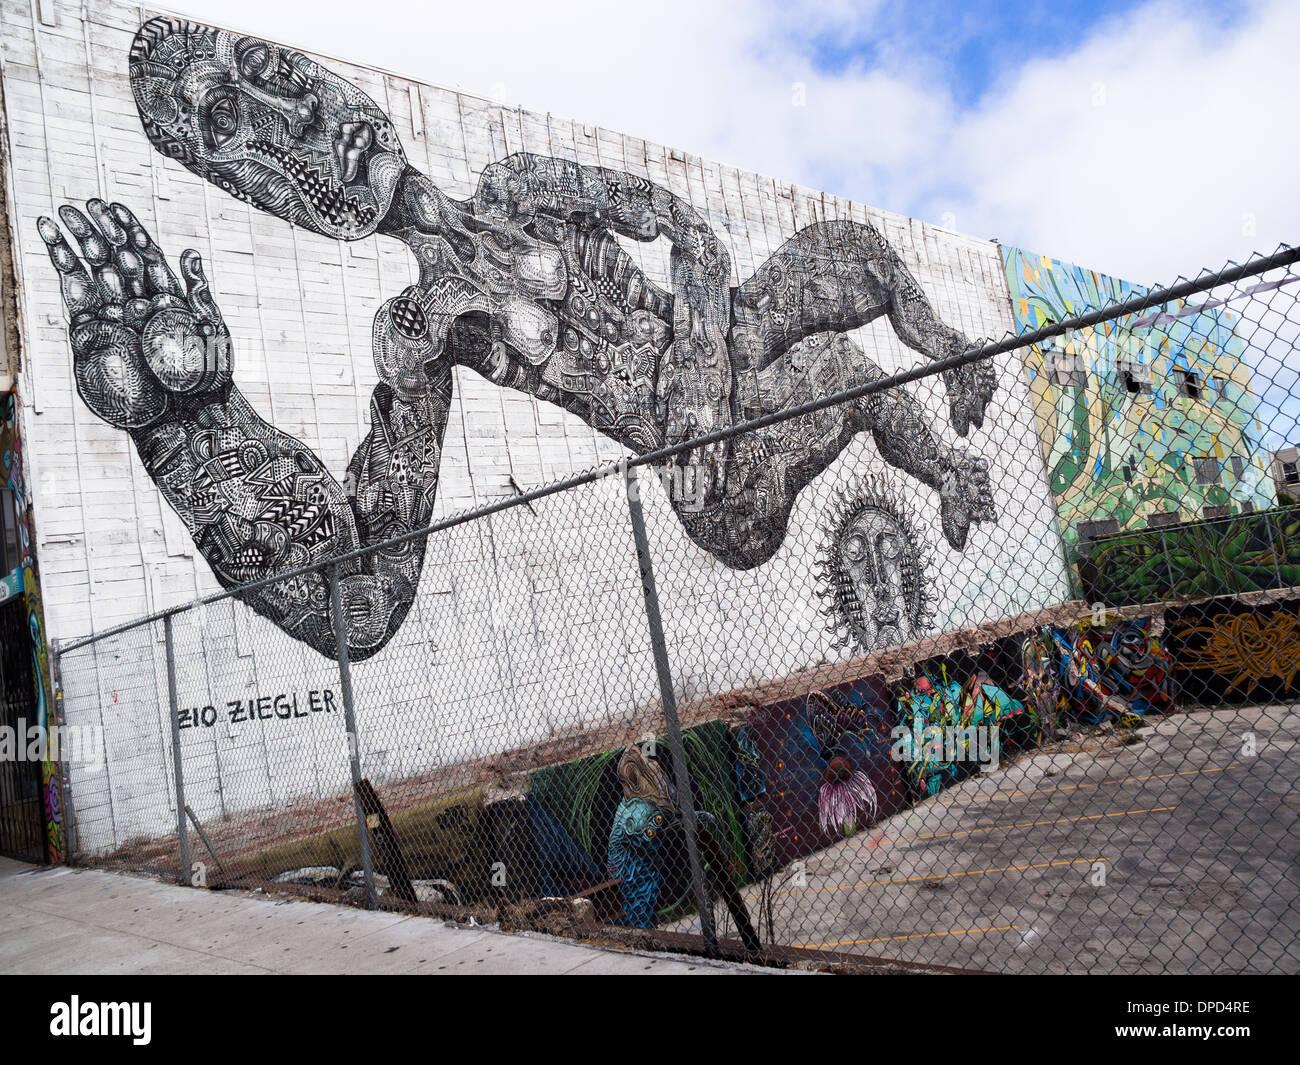 Giant Street Art Mural by Zio Ziegler in San Francisco Stock Photo